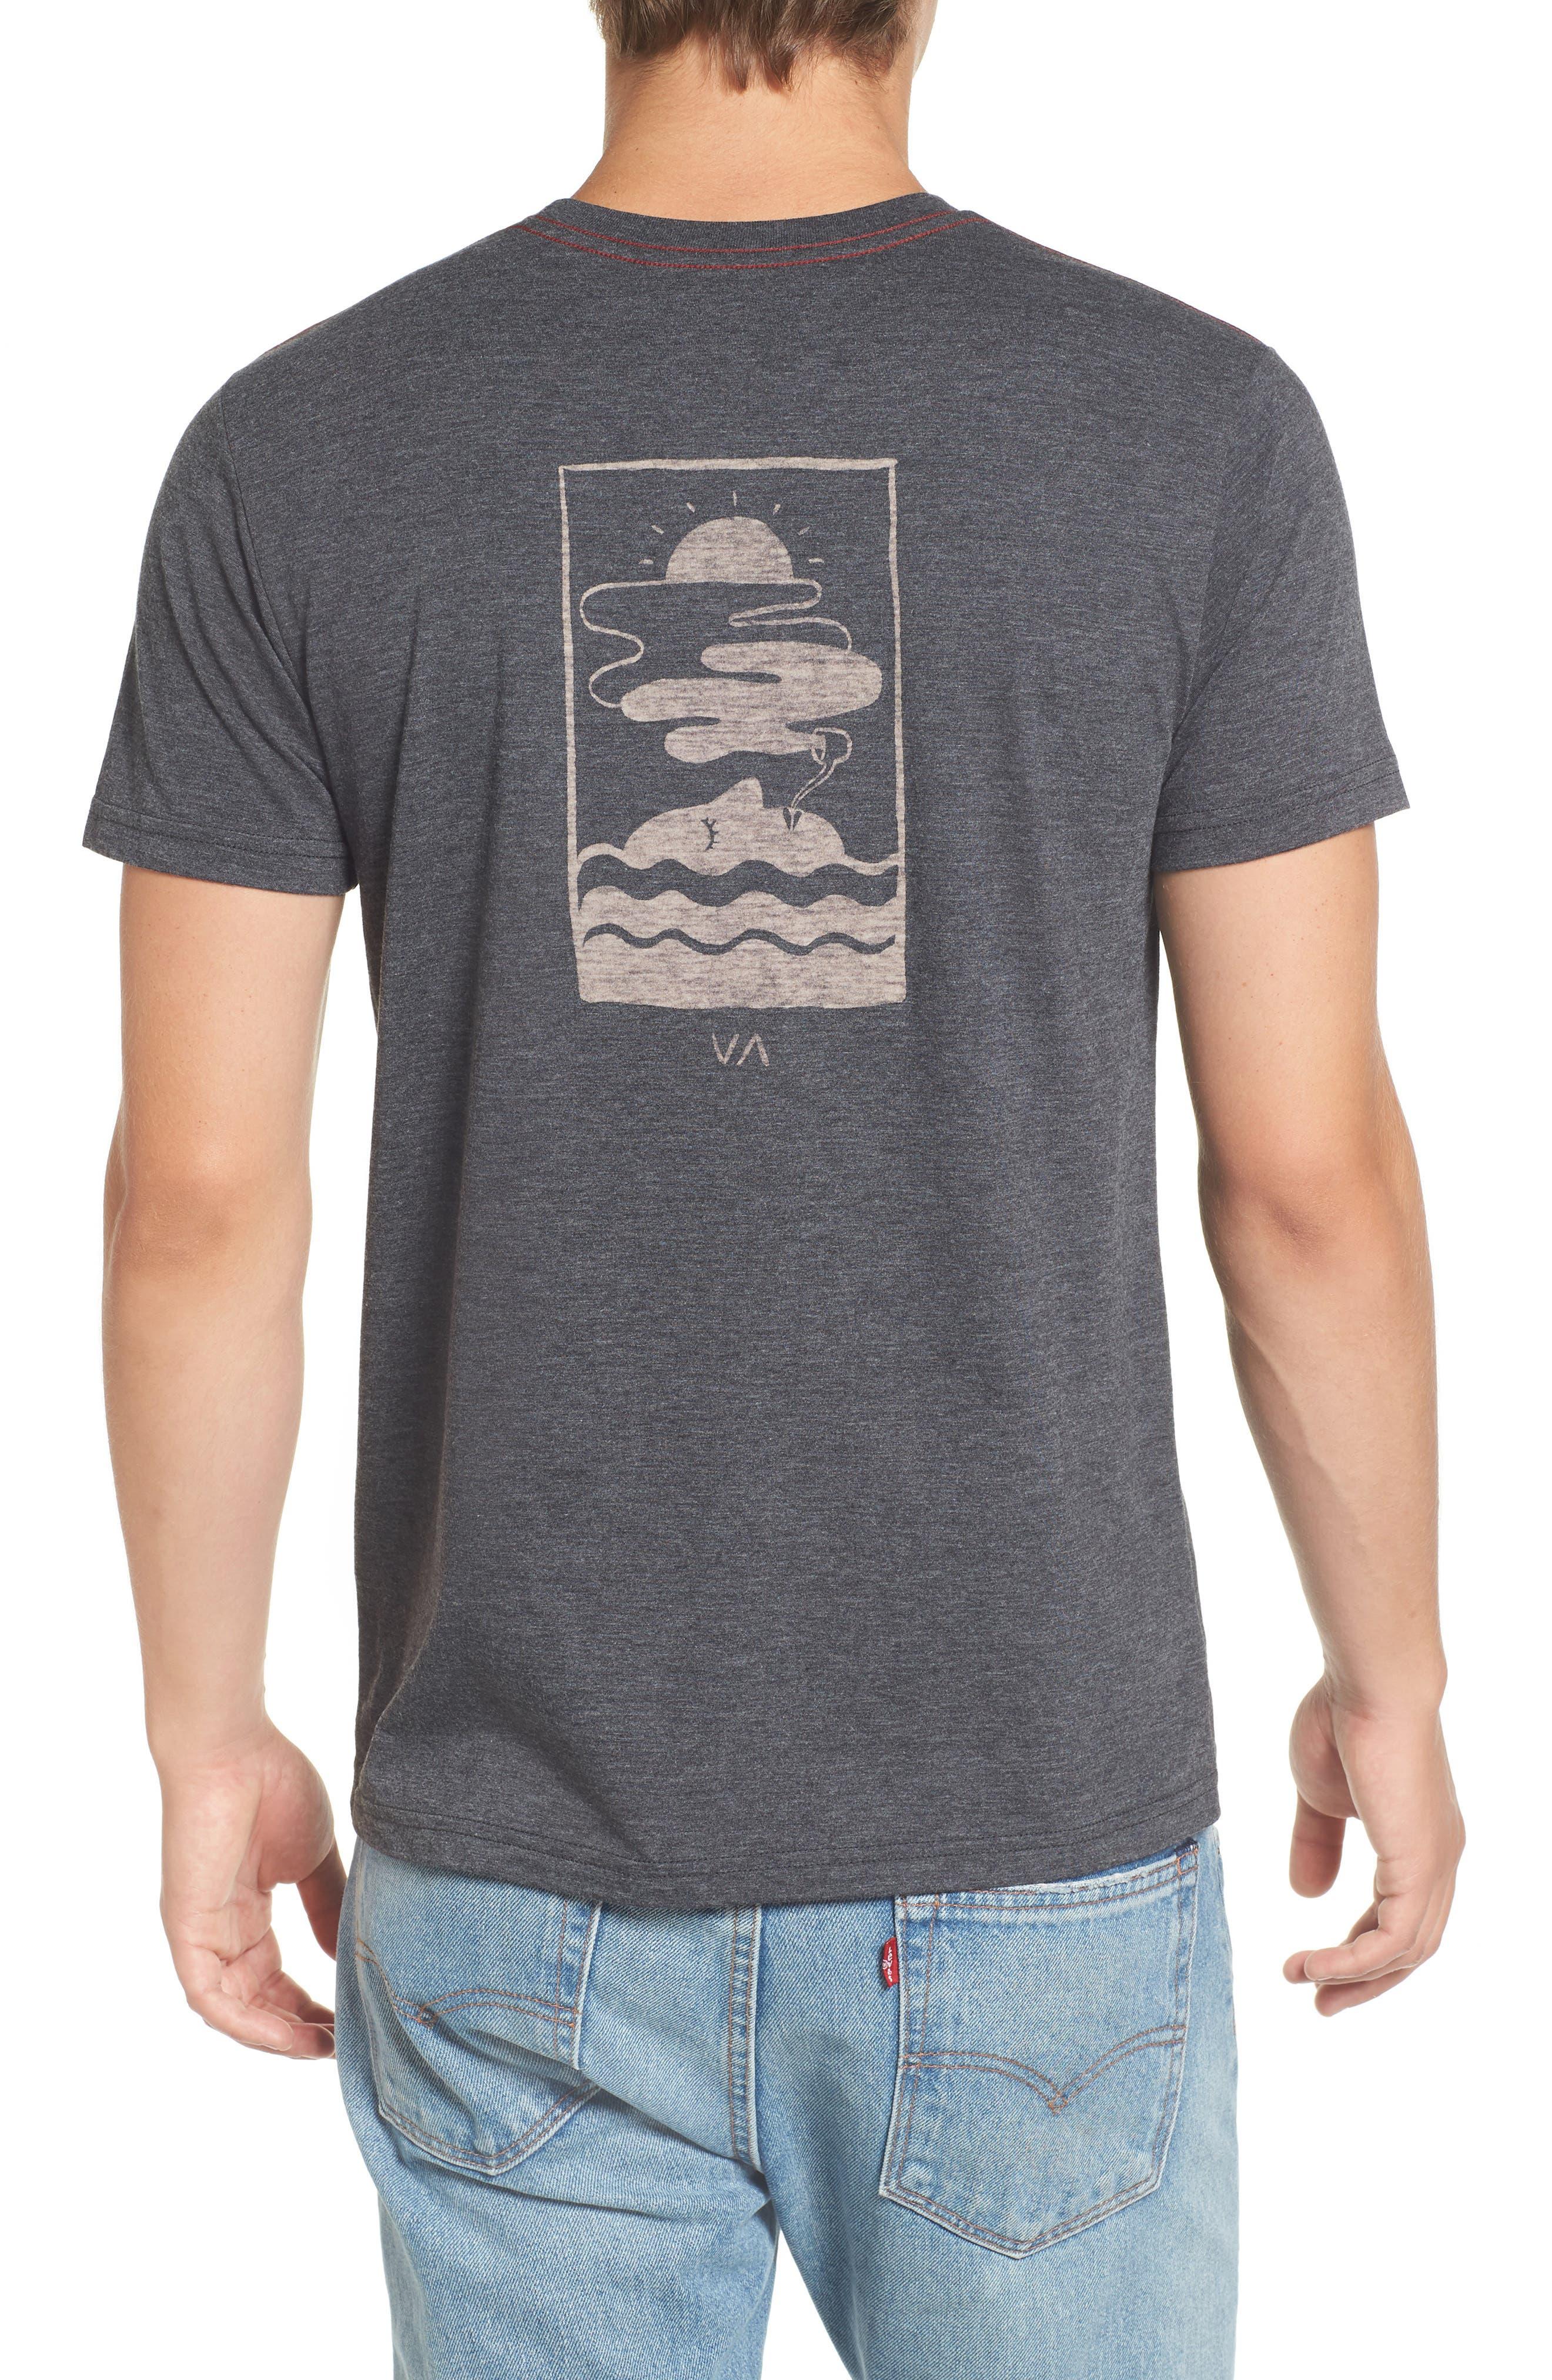 Snooze Cloud Graphic T-Shirt,                             Alternate thumbnail 2, color,                             001